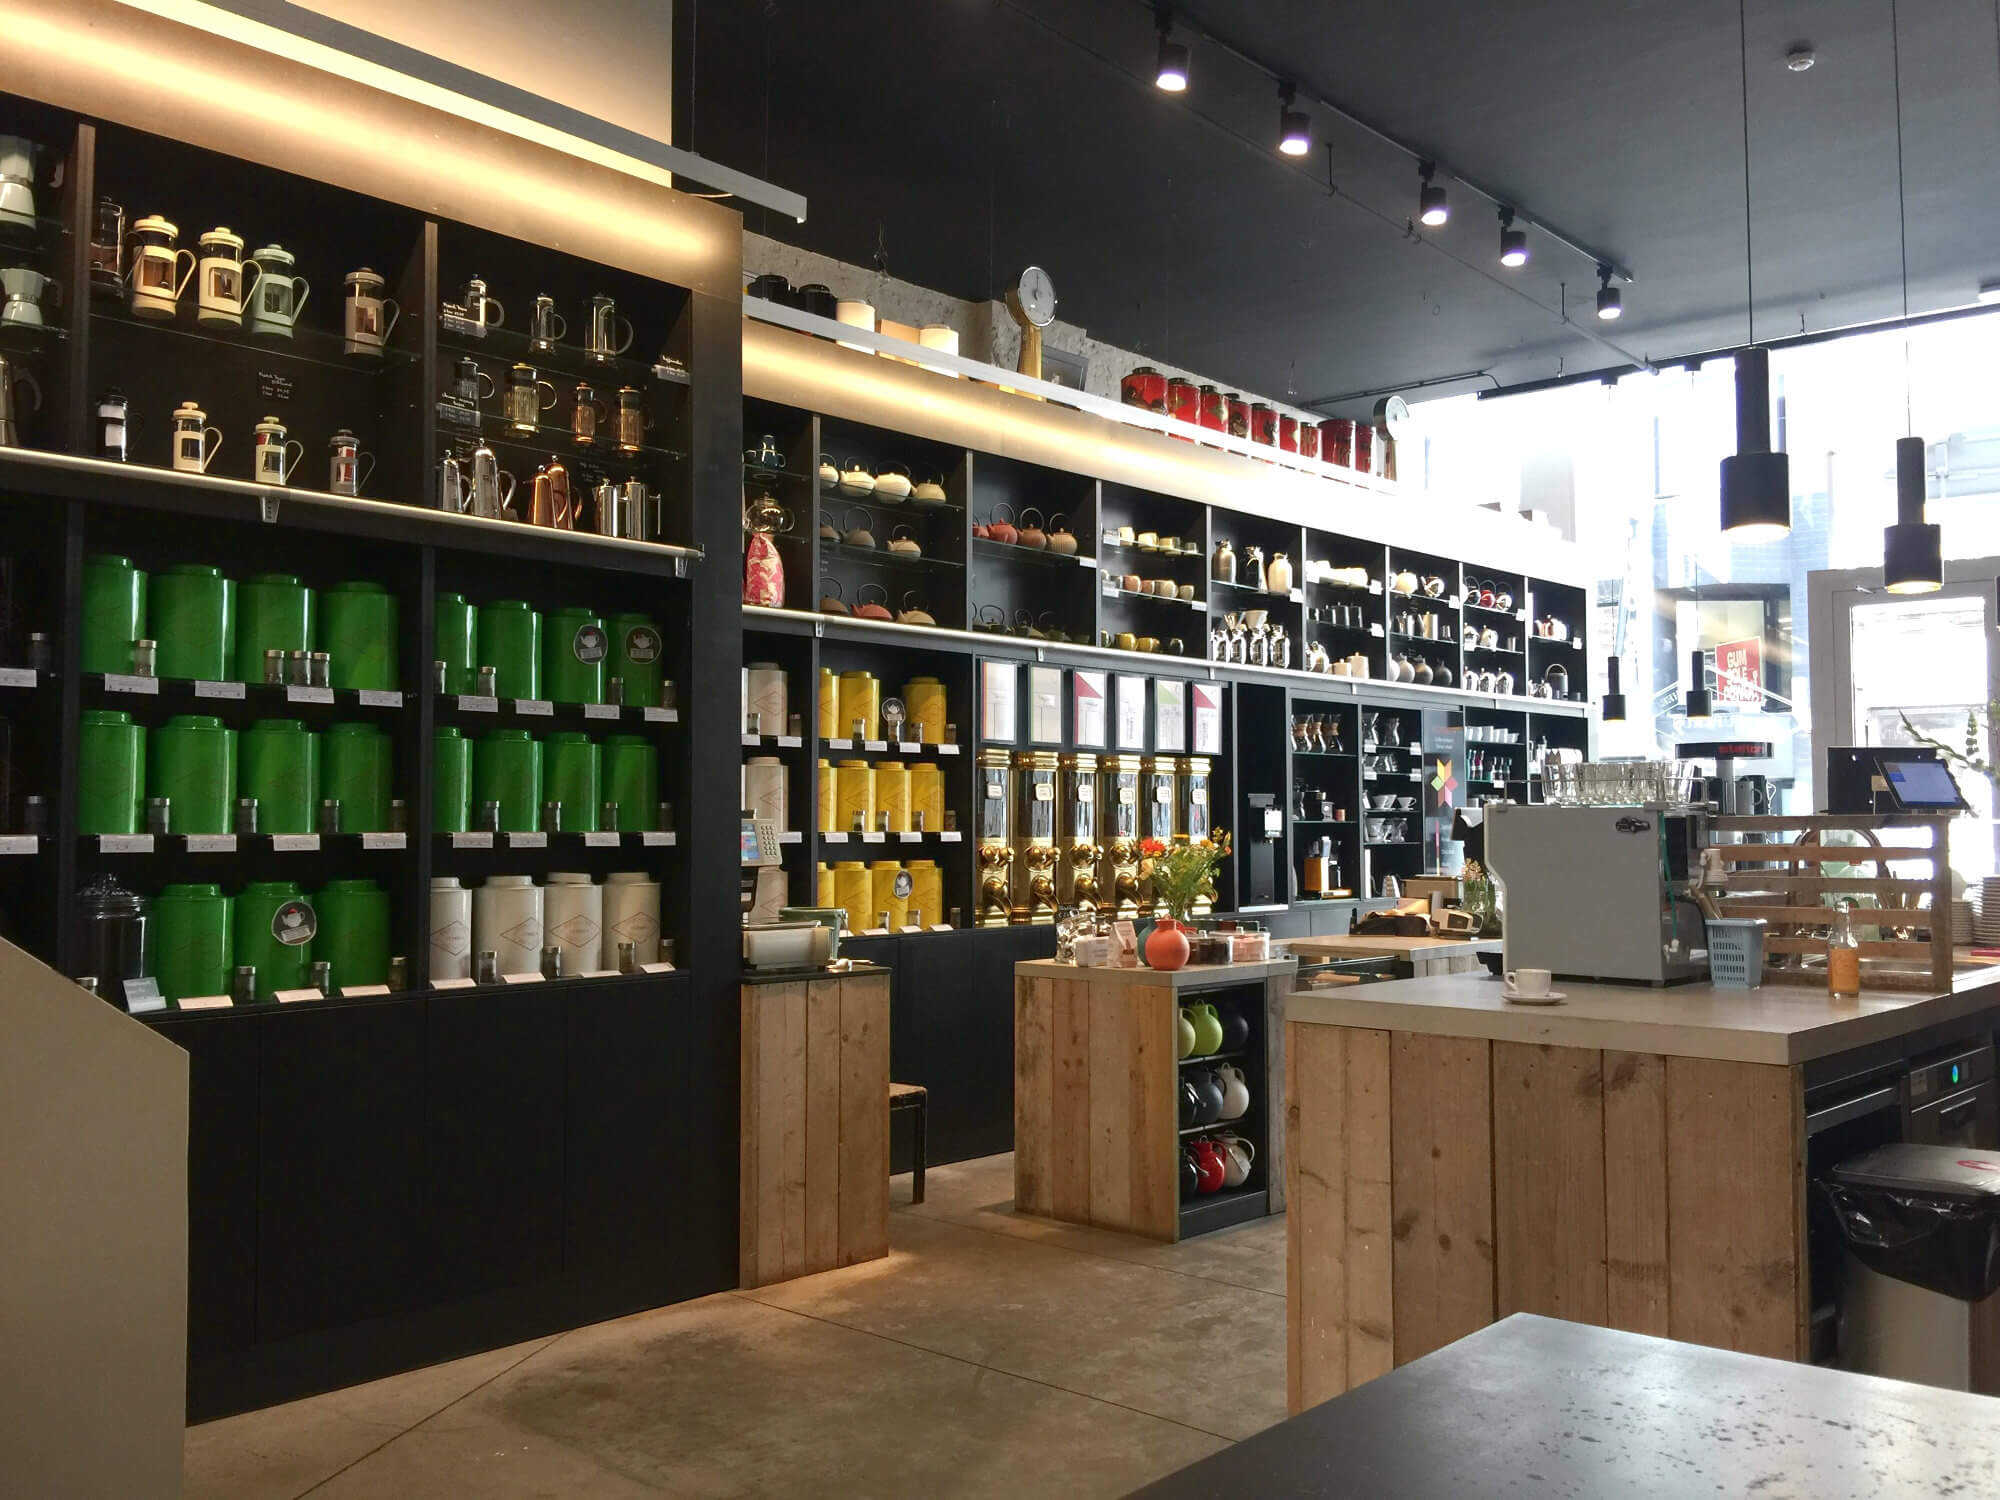 Café in Antwerpen: Cuperus